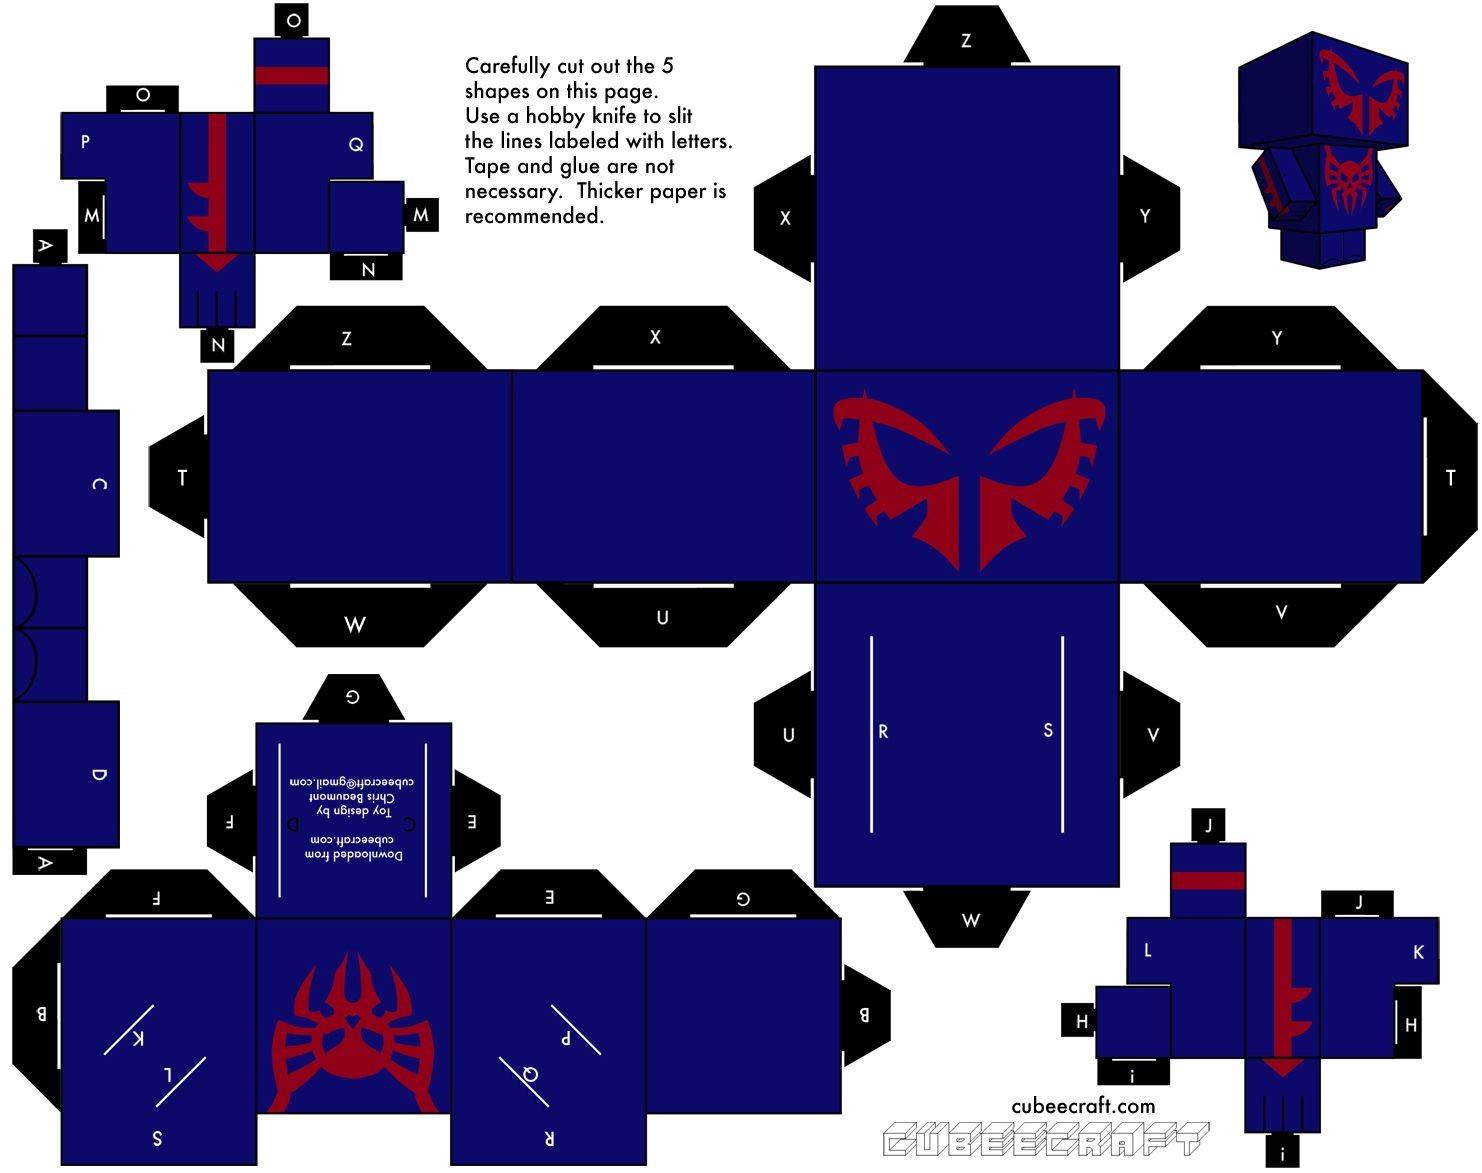 South Park Papercraft Marvel En Cubeecraft Pinterest